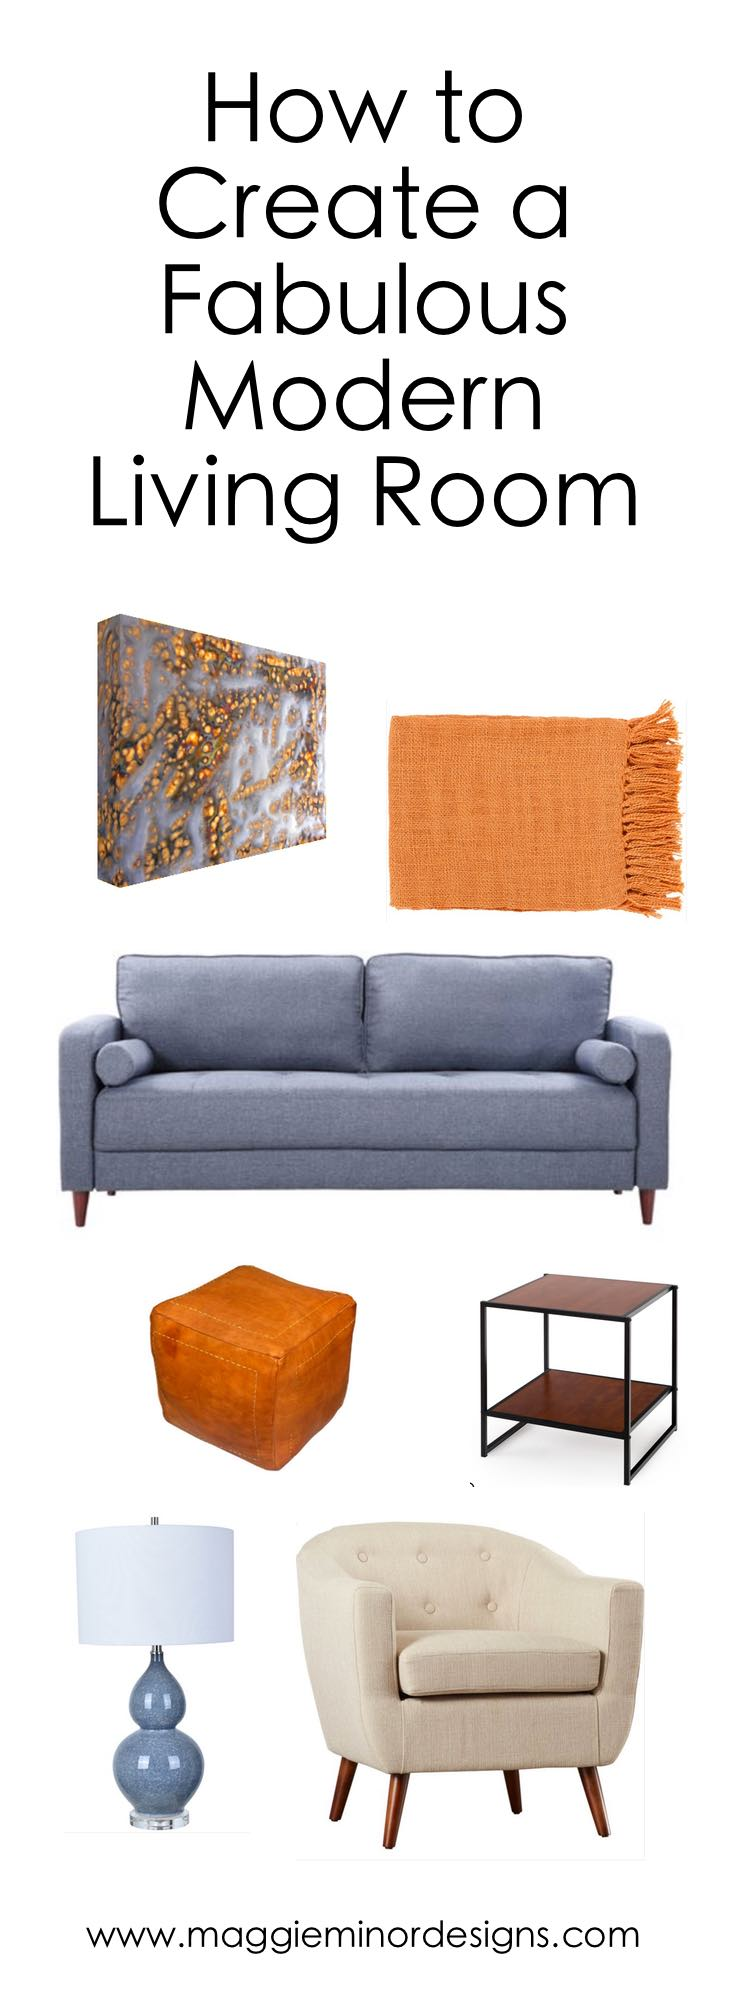 How to Create a Fabulous Modern Living Room Pinterest long.jpg